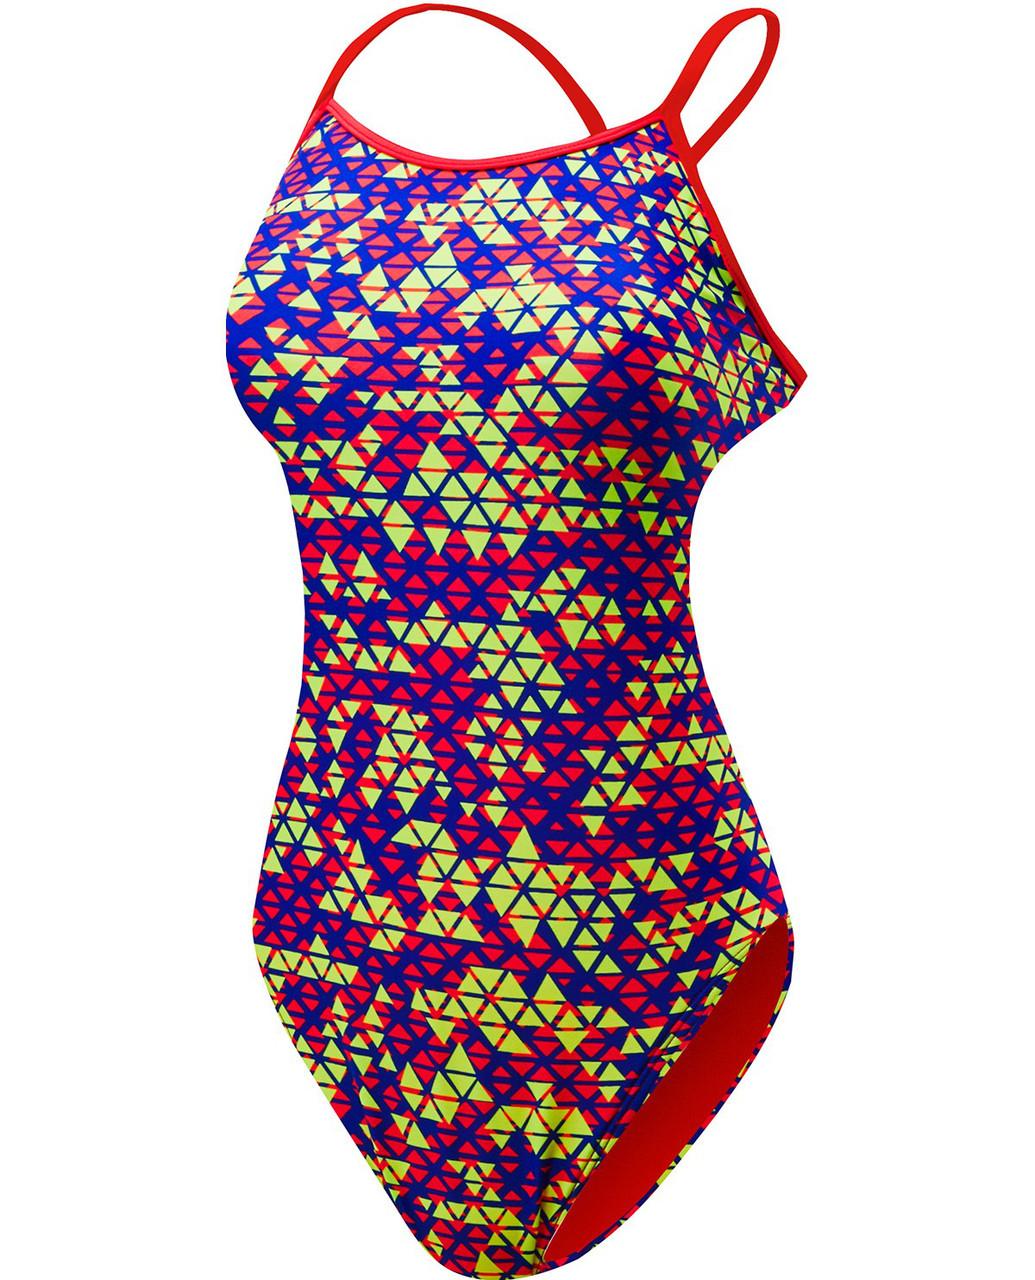 Купальник TYR Women's Modena Trinityfit Swimsuit 638 - фото 3